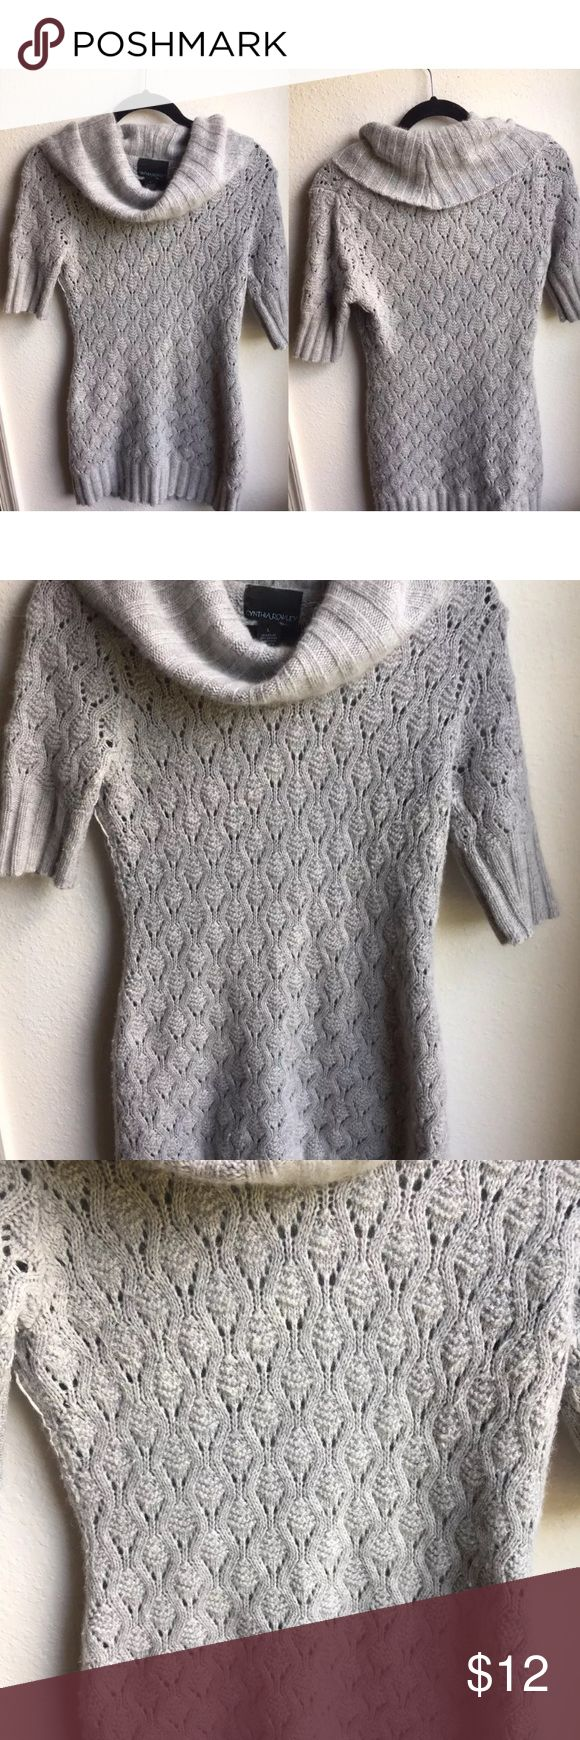 "Cynthia Rowley Cowl Neck Sweater Dress Sz L Cynthia Rowley Women's Cowl Neck Wool Blend Knit Short Sleeve Sweater Dress Sz L bust 19"" length 36"" Cynthia Rowley Dresses Mini"